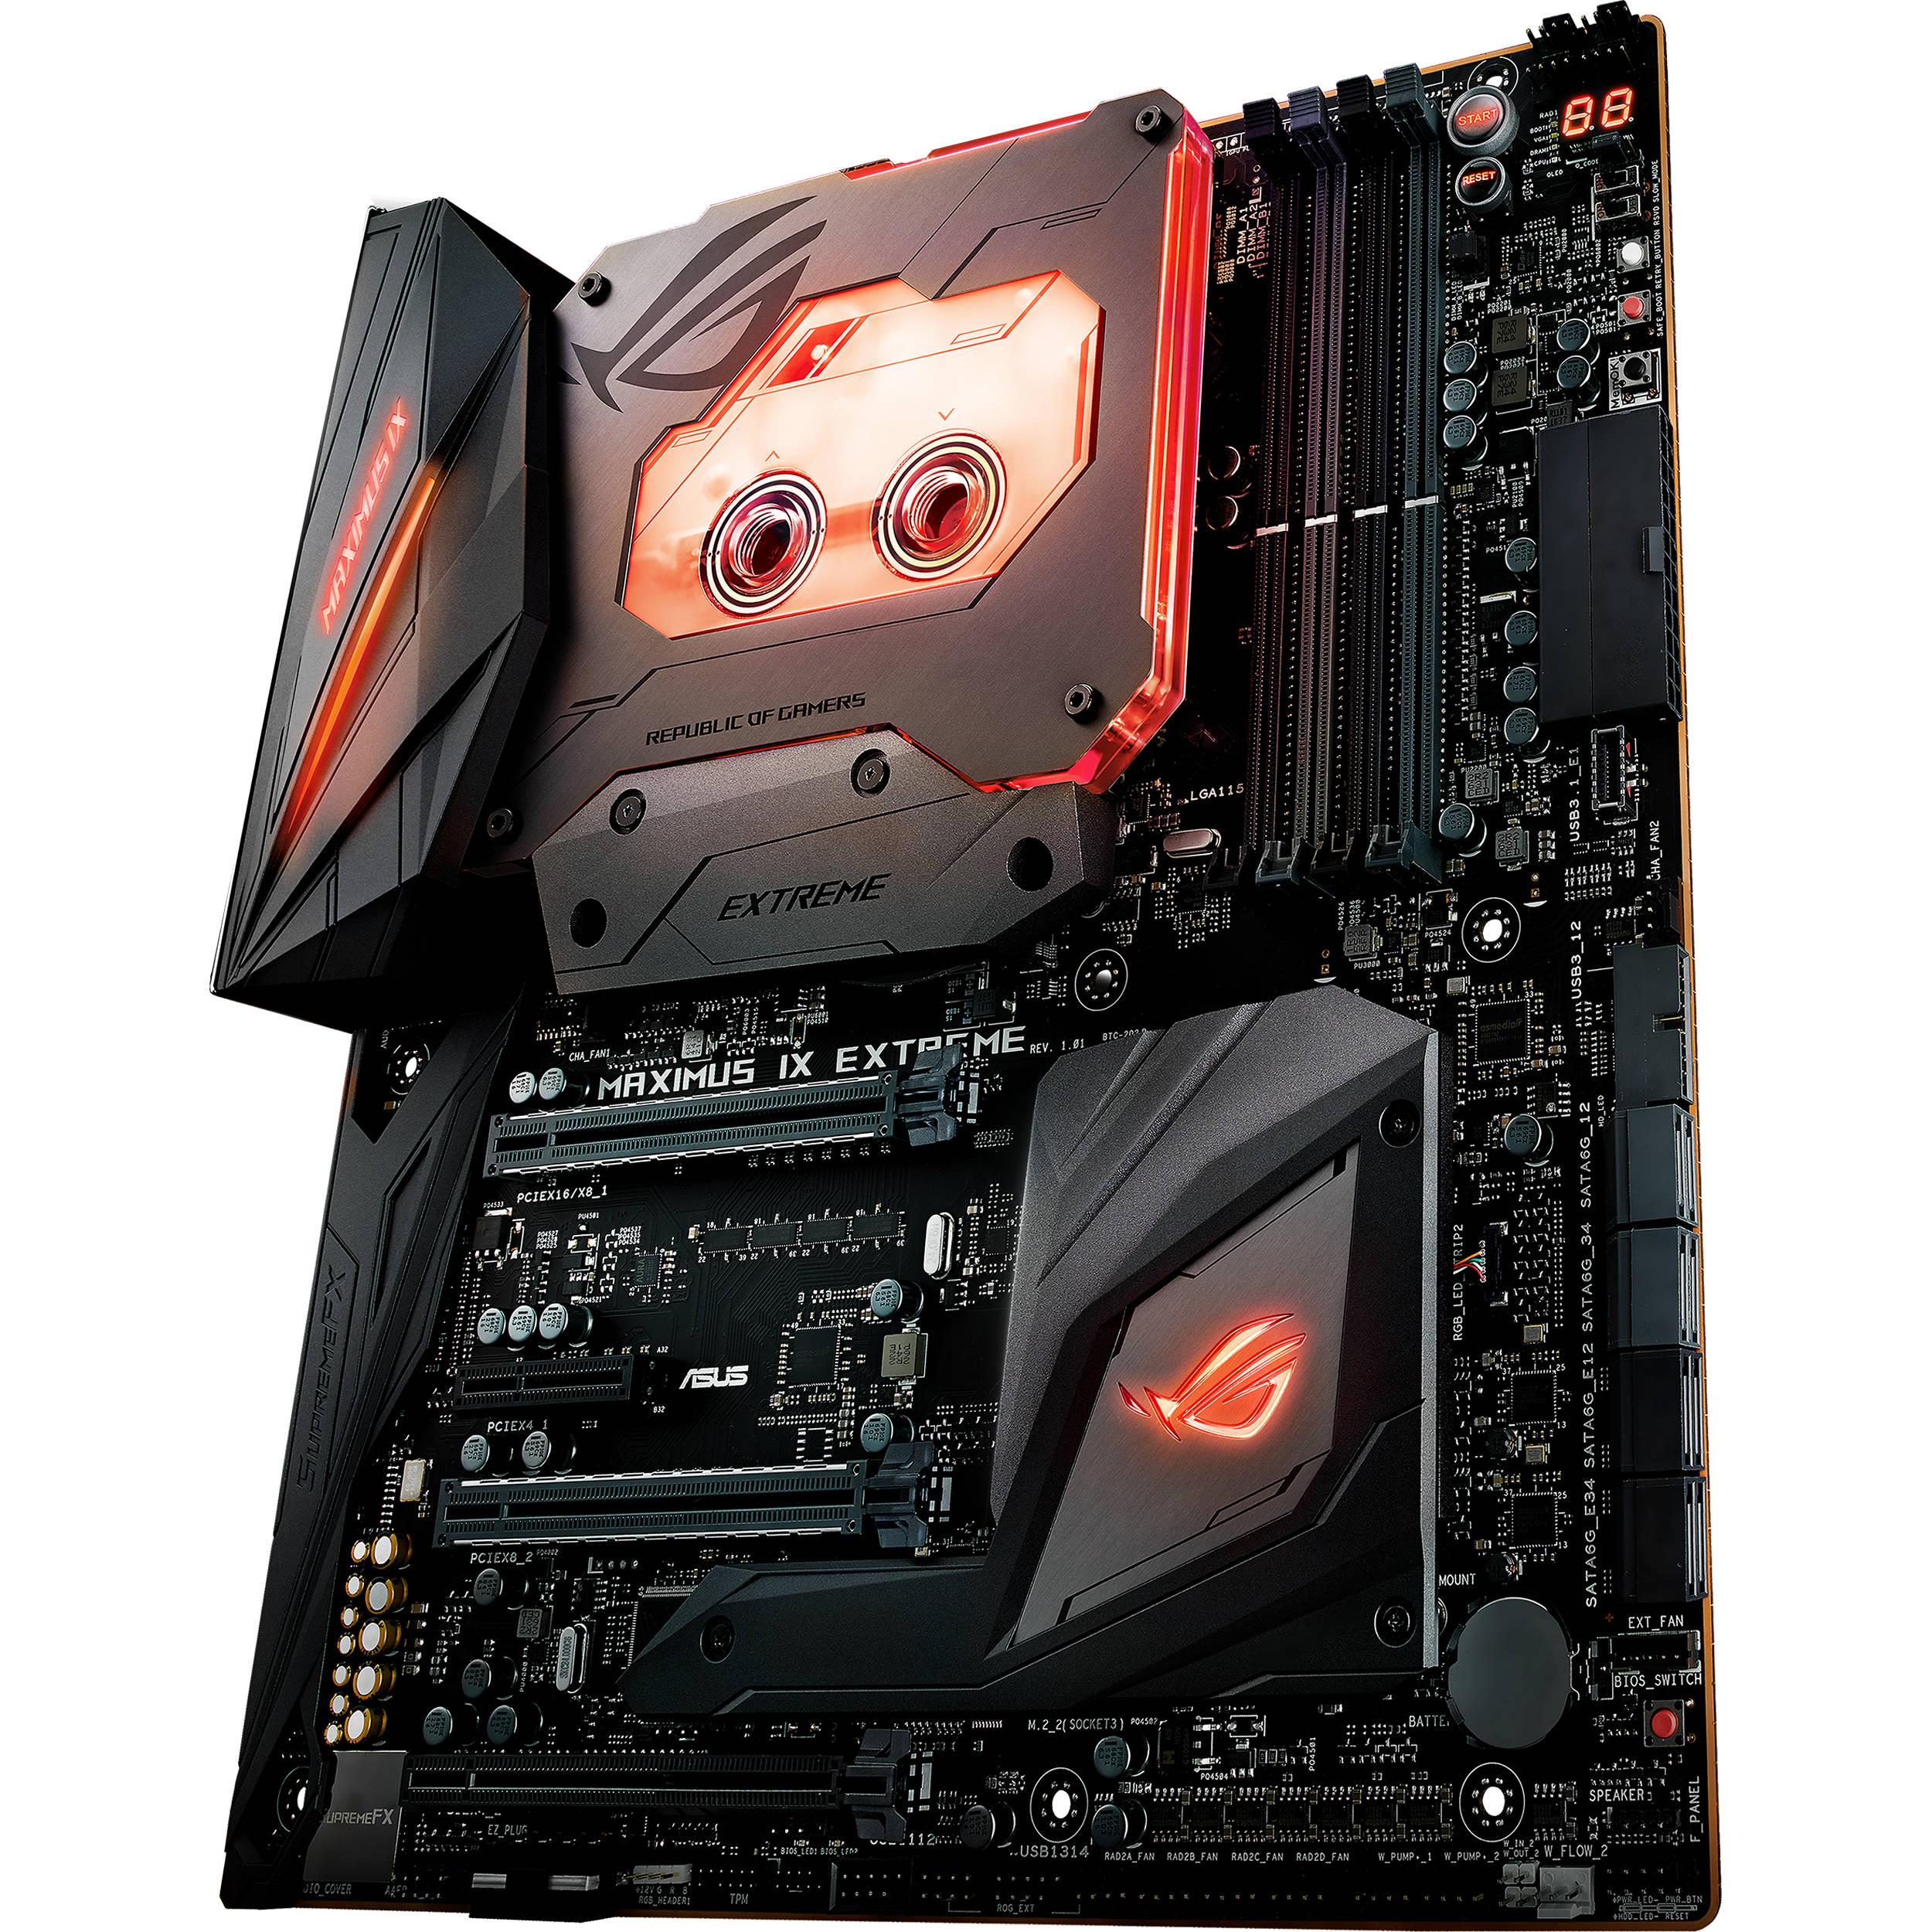 ASUS Republic of Gamers Maximus IX Extreme Z270 LGA 1151 E-ATX Motherboard